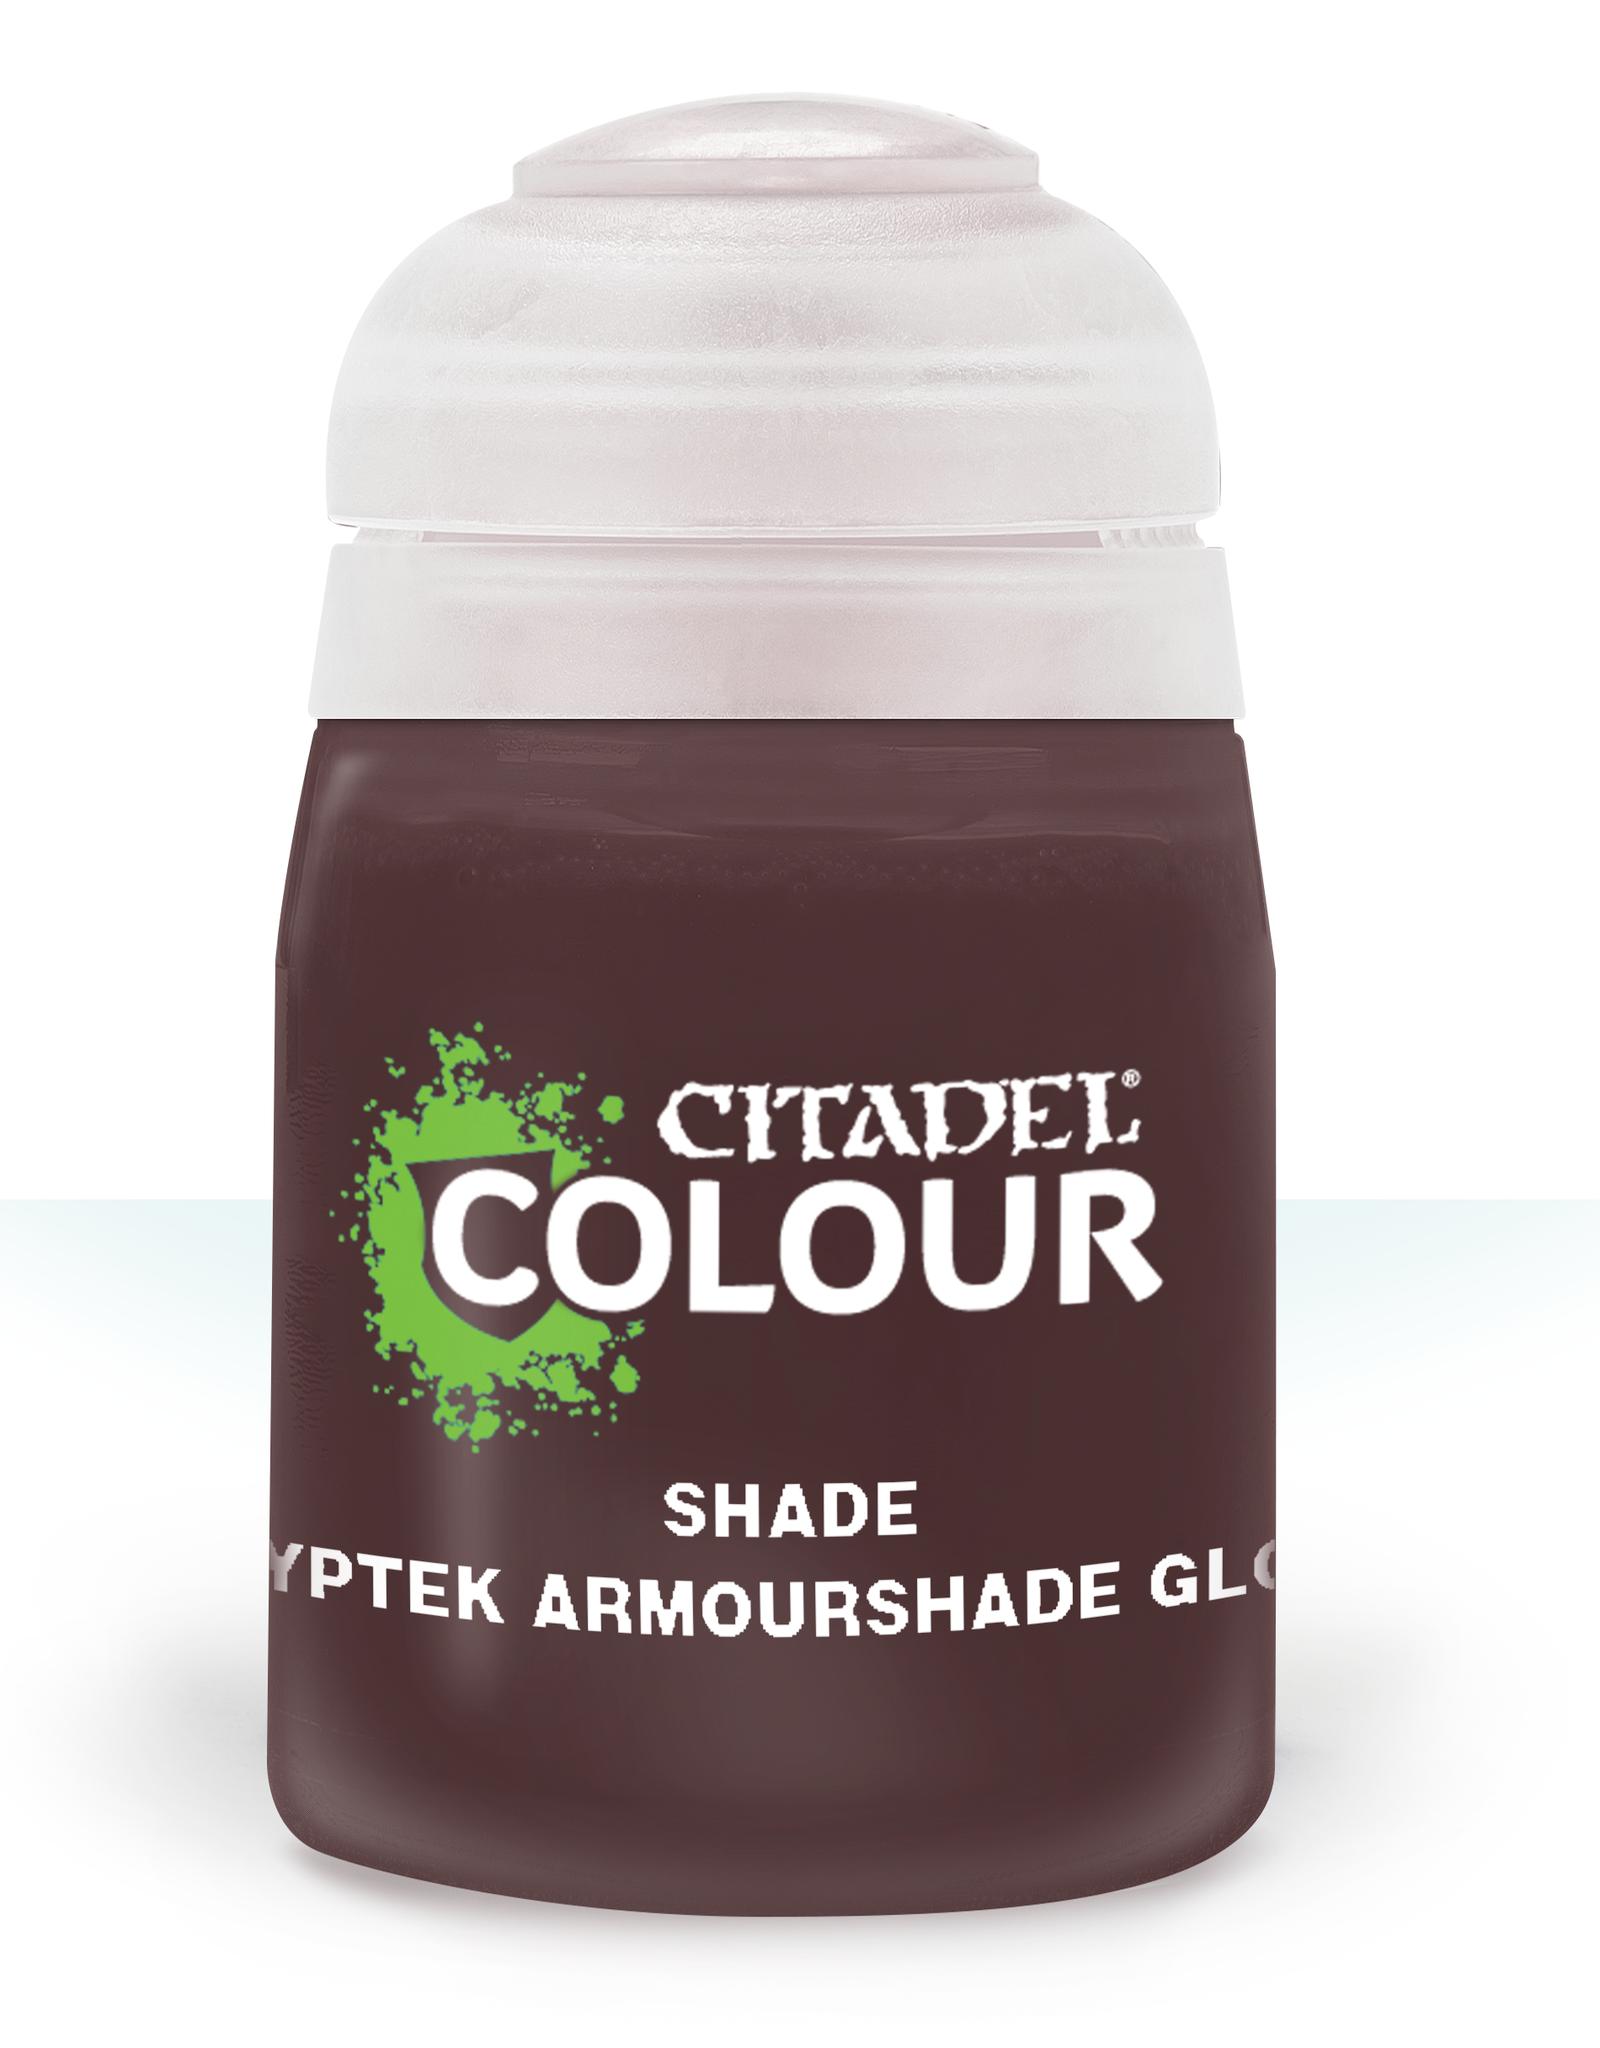 Games Workshop Citadel Shade: Cryptek Armourshade Gloss (18ml)